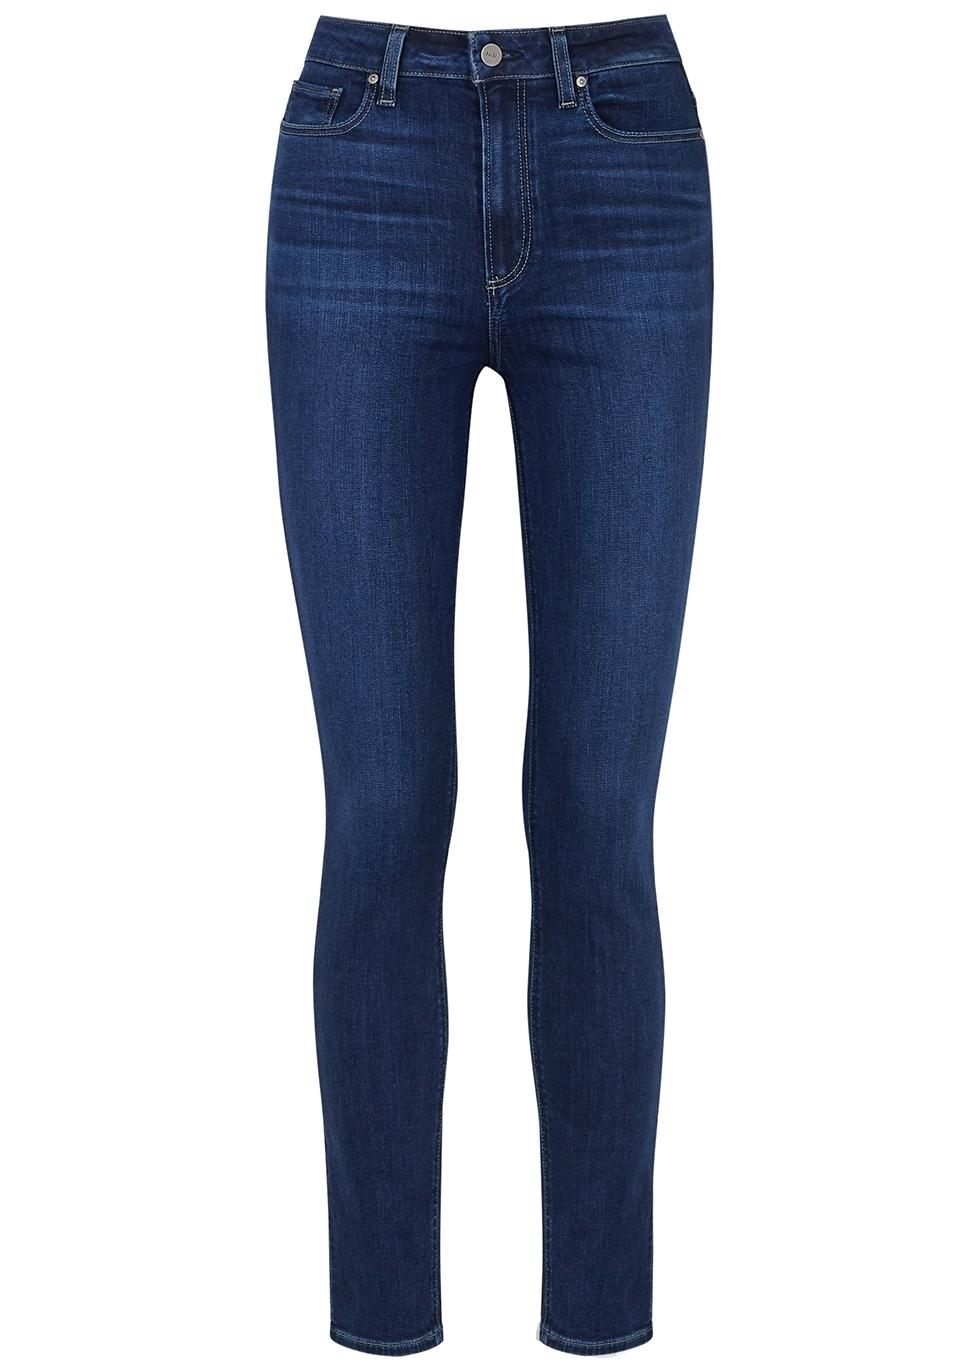 Margot Transcend blue skinny jeans